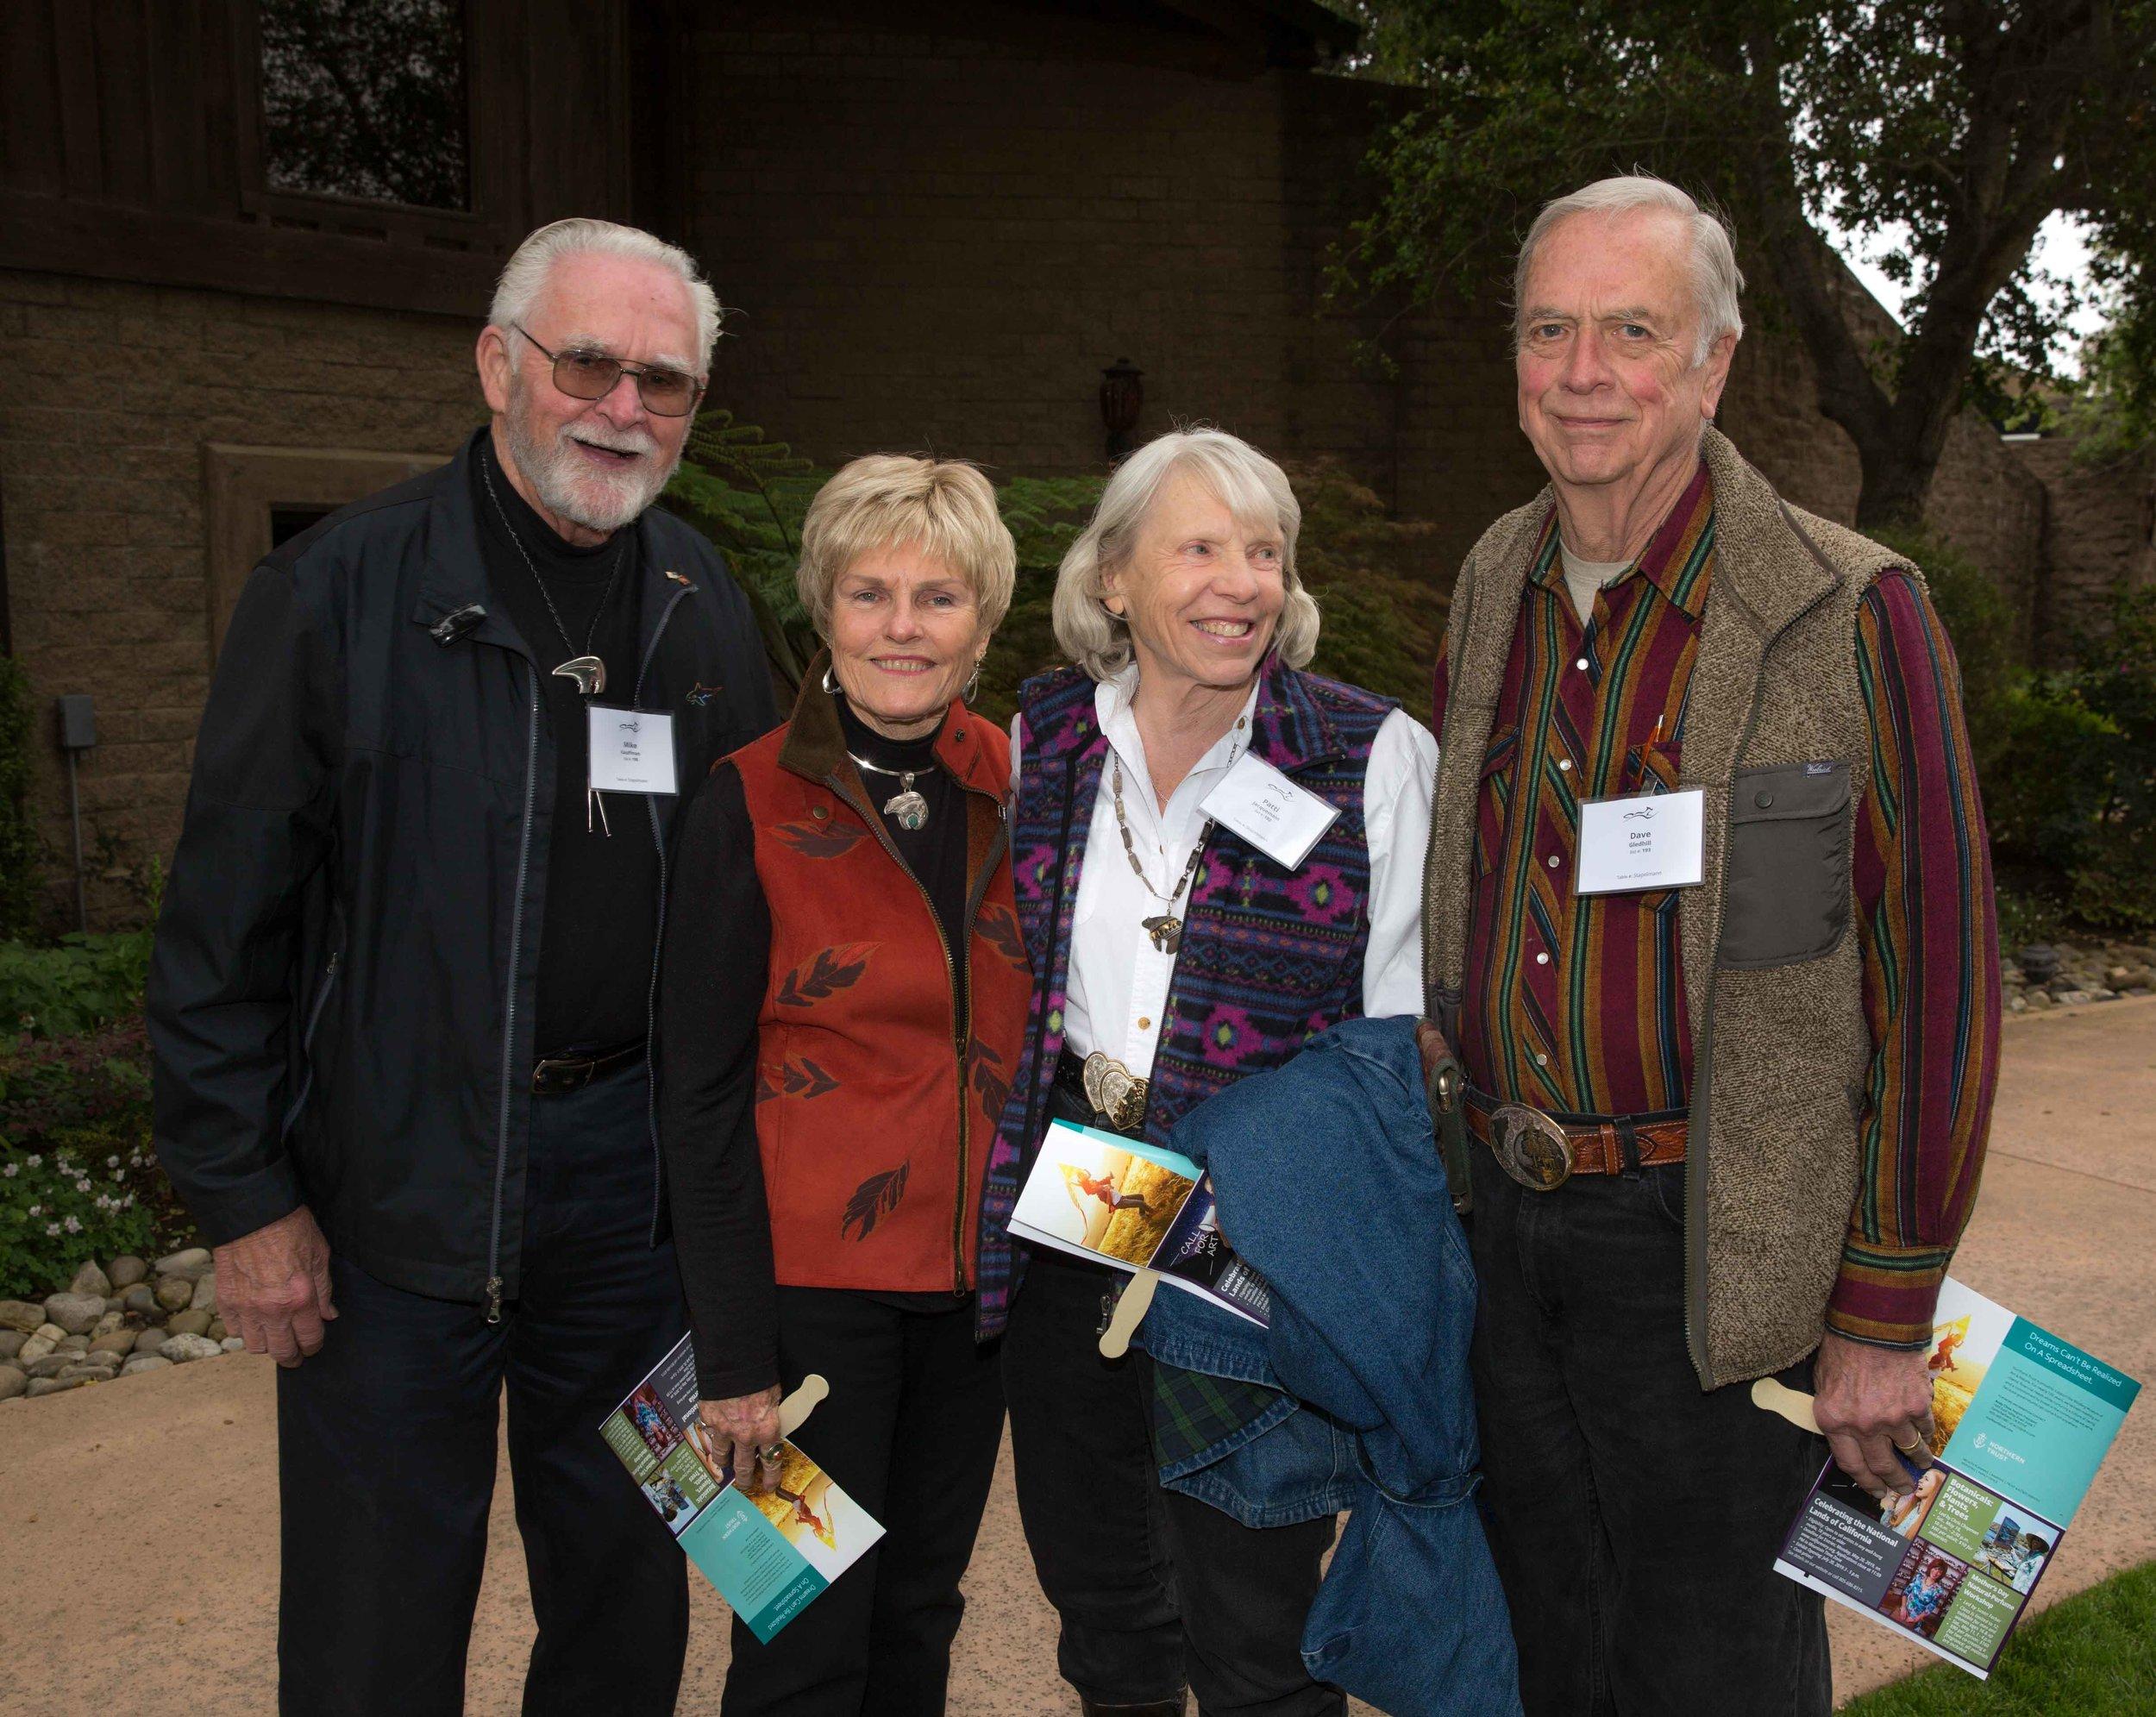 Mike and Marian Kauffman with Patti Jacquemain, Founder, Emeritus and David Gledhill, Treasurer